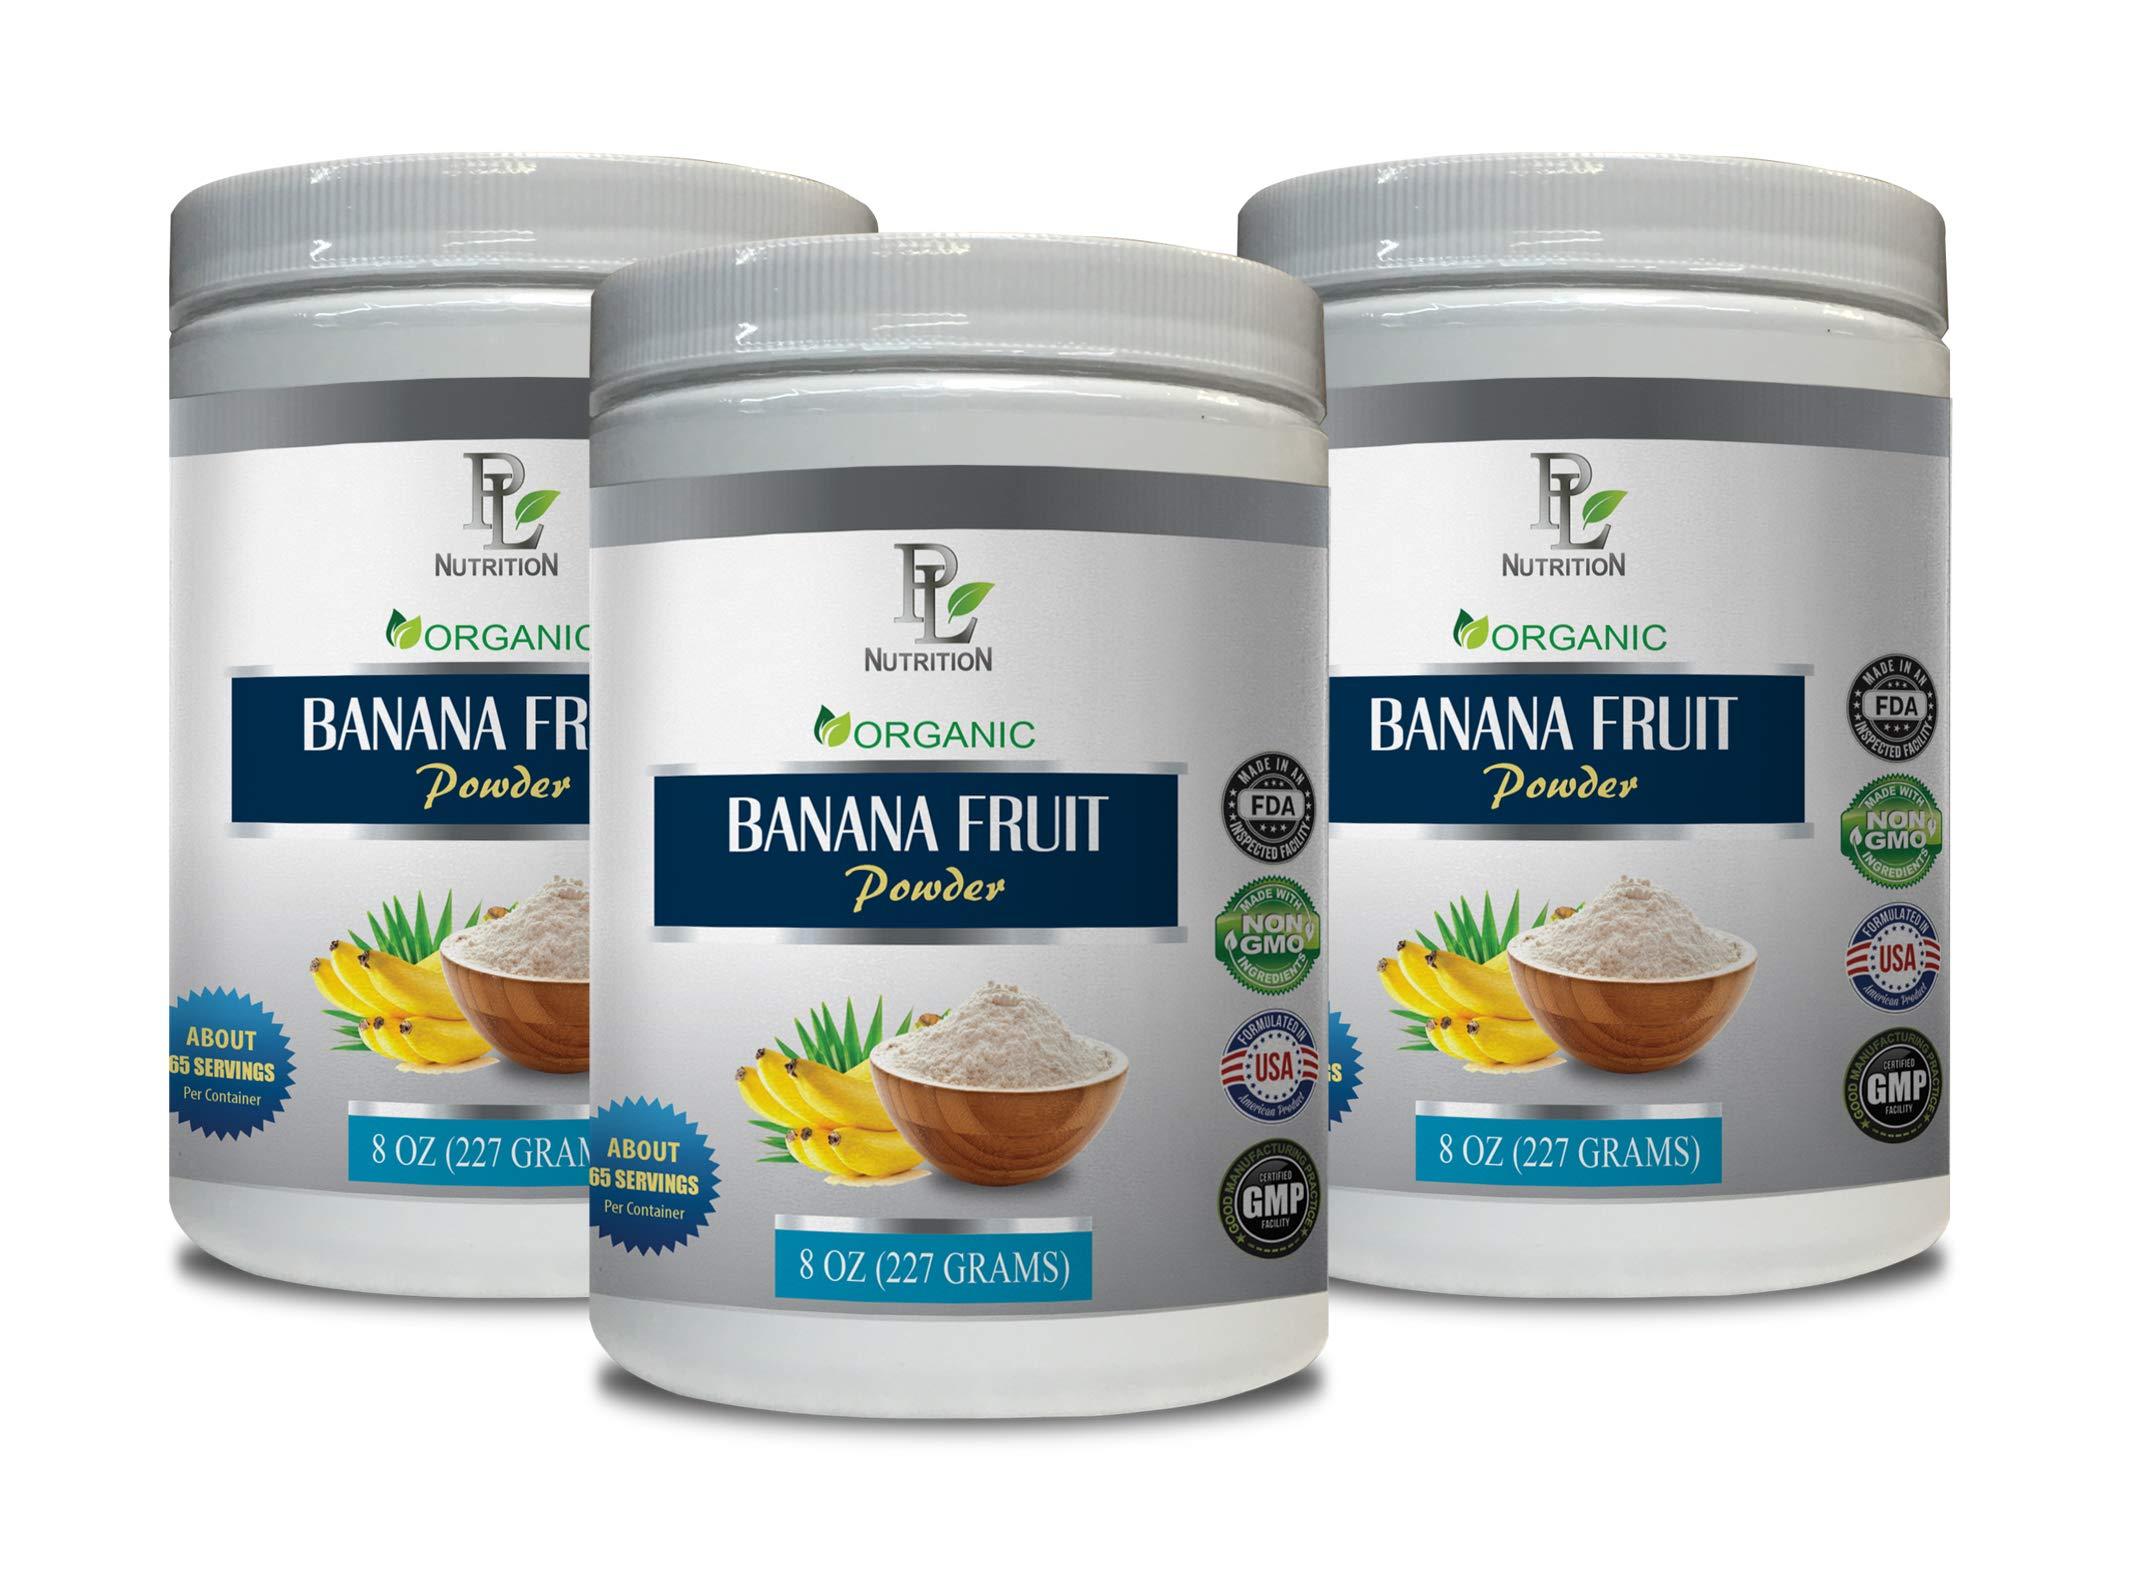 Cardiovascular Care - Banana Fruit - Organic Powder - Digestion Plus - 3 Cans 24 OZ (195 Servings)